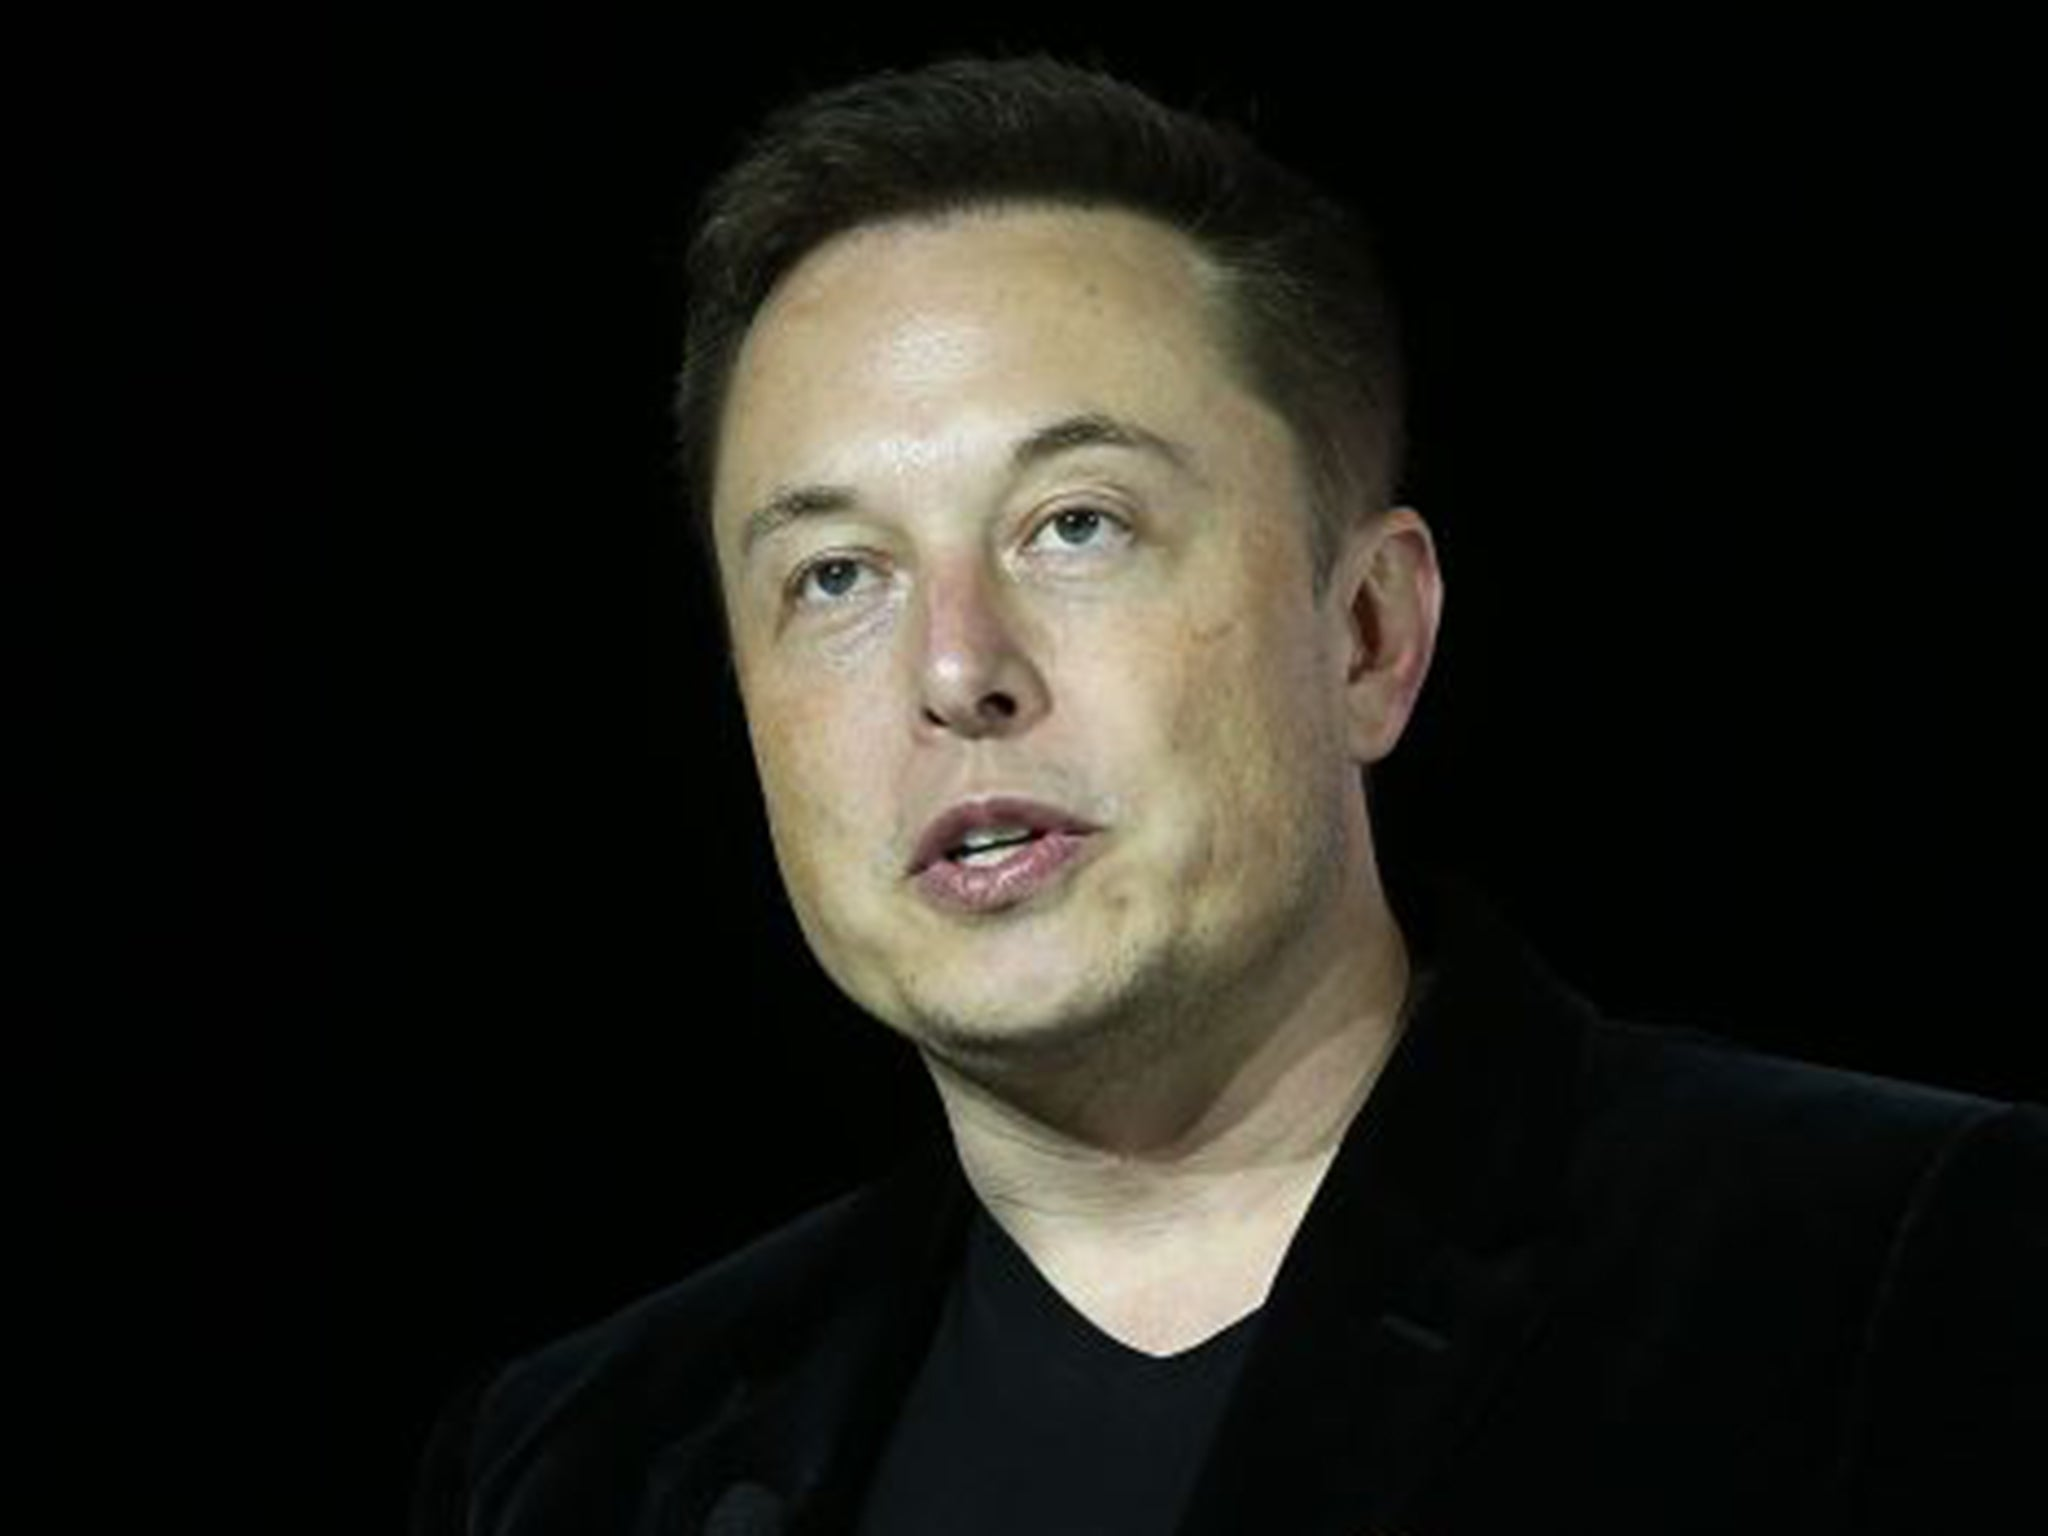 Elon Musk Personally Cancels Customer S Tesla Model X